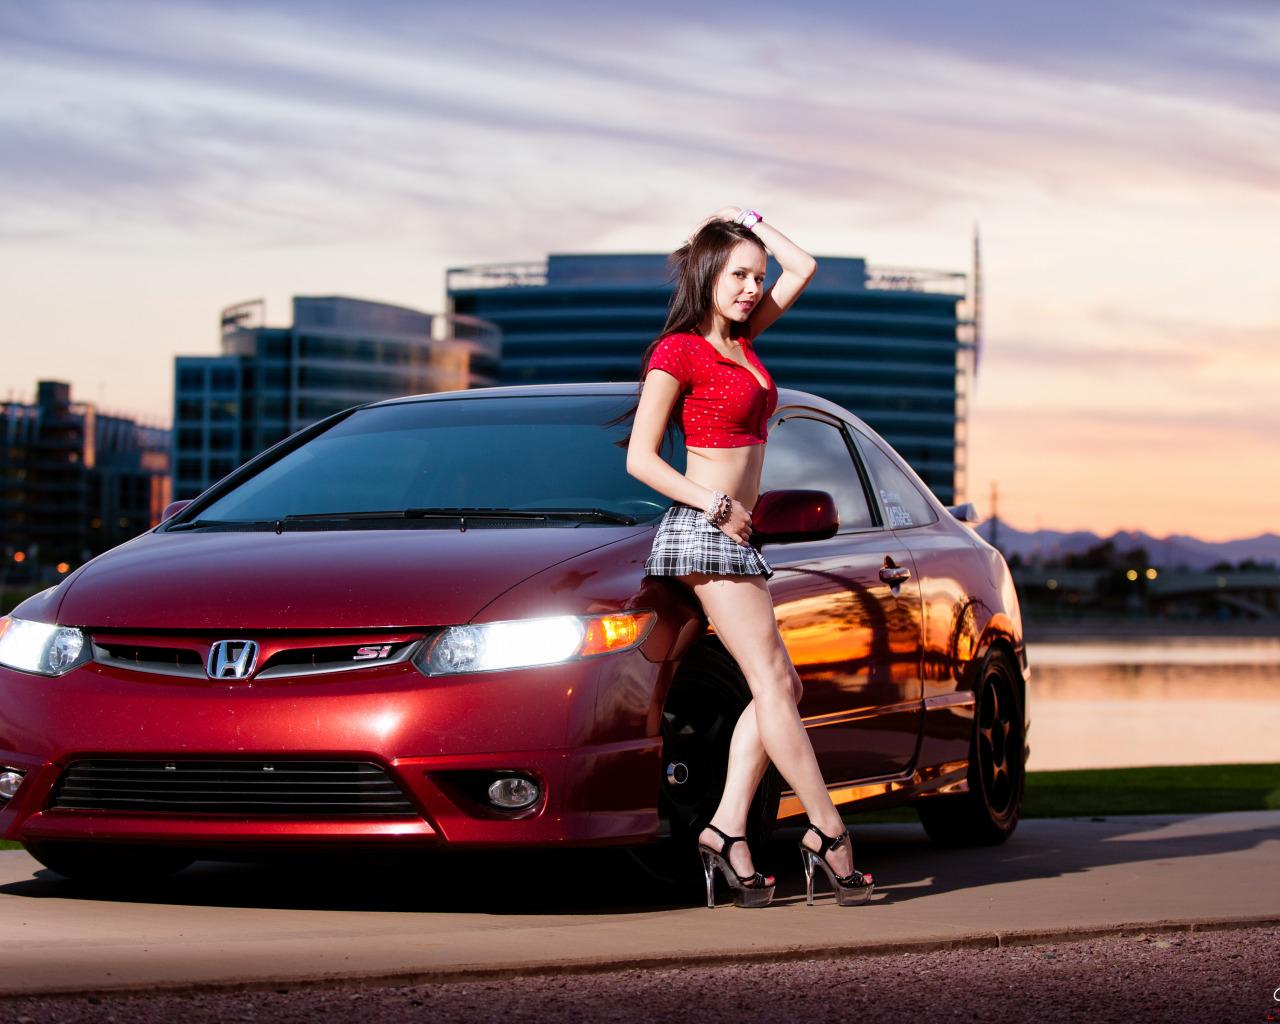 когда перспектива автомобили и девушки фото женских имитатор